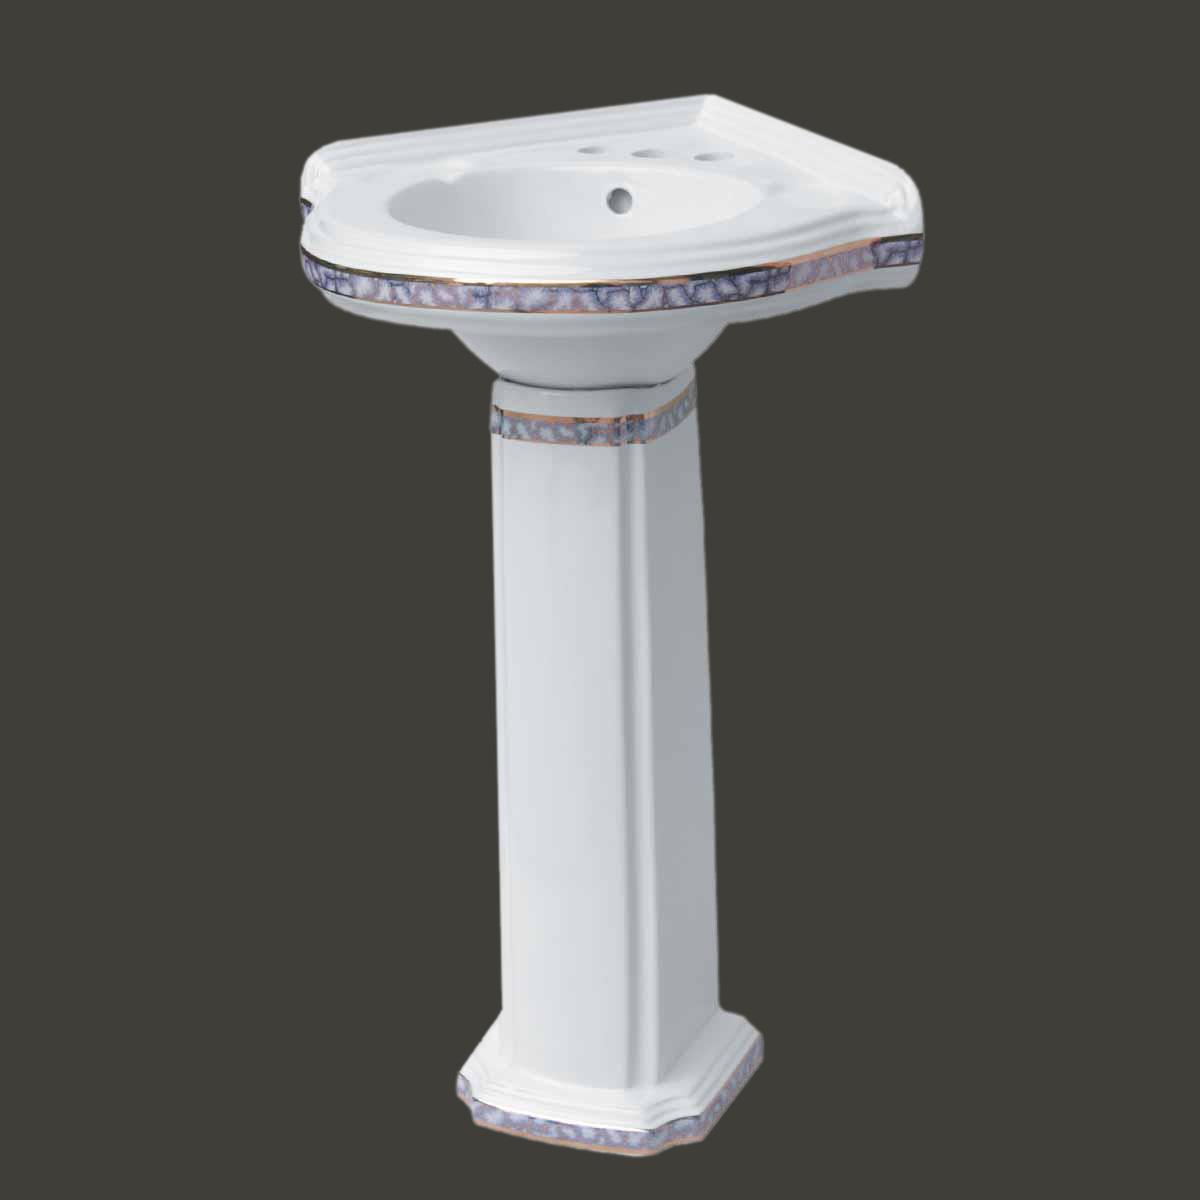 Bathroom Corner Pedestal Sink White China Gold Trim